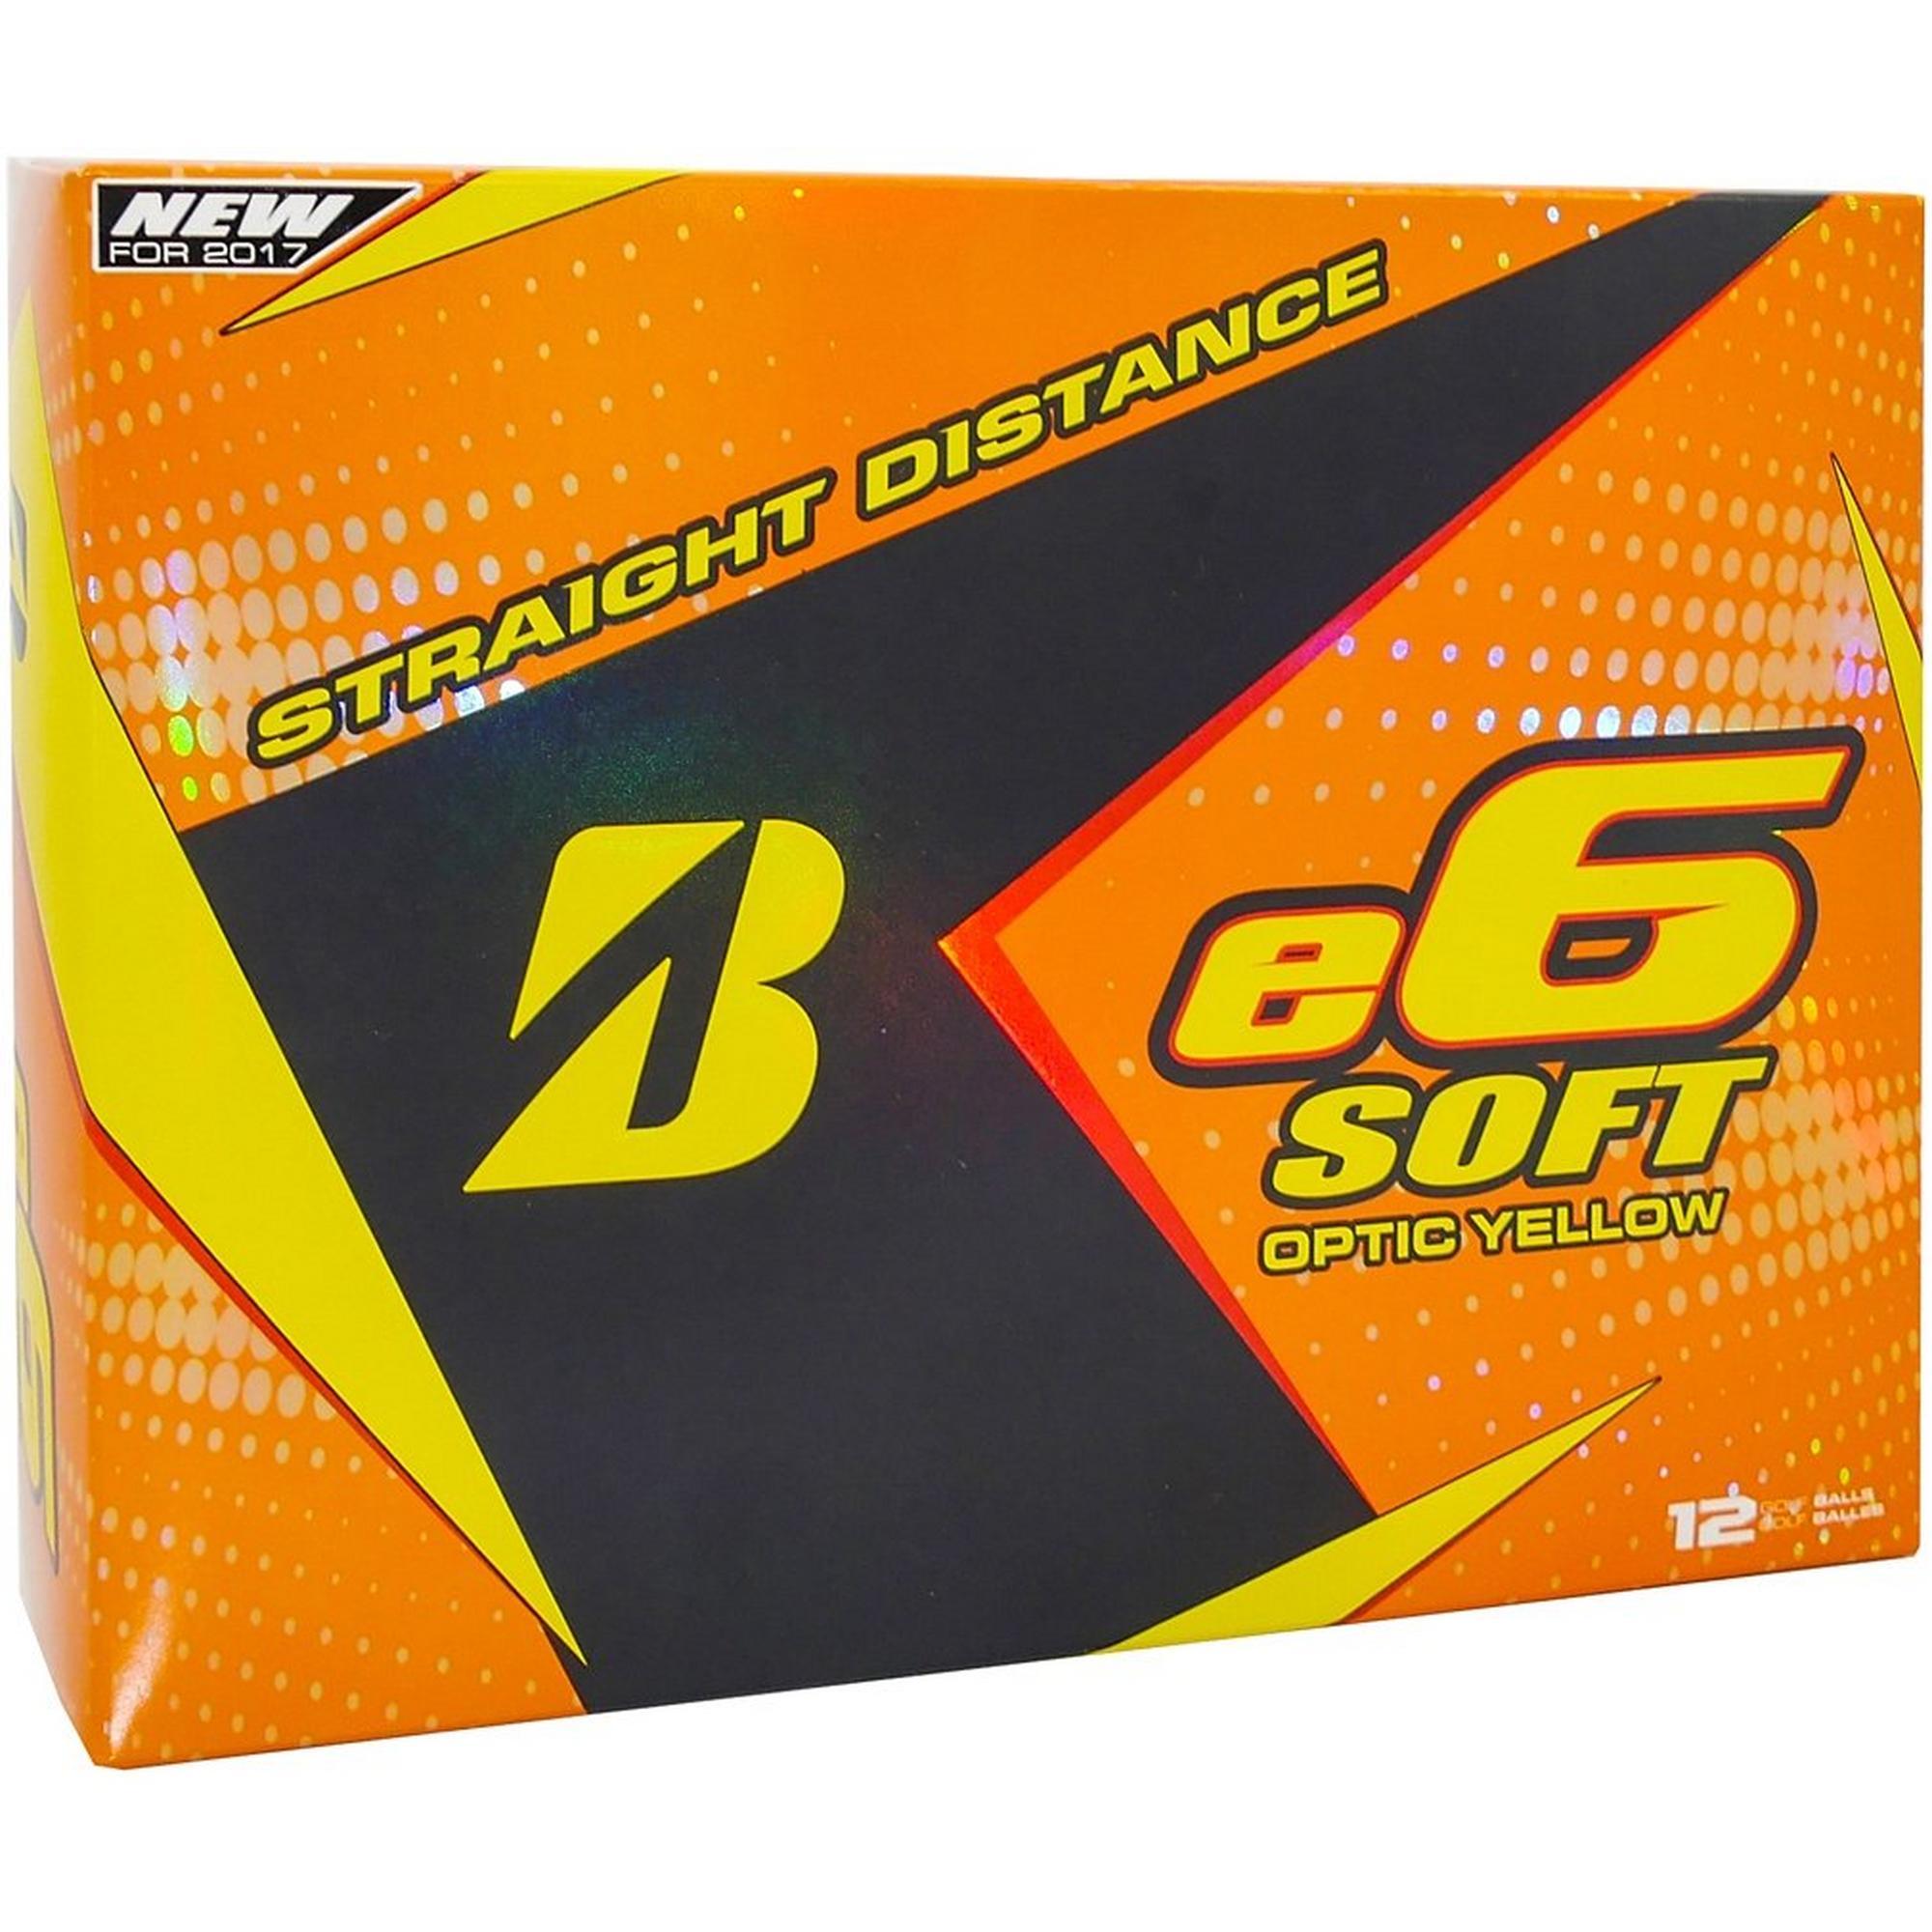 e6 Soft Yellow Golf Balls